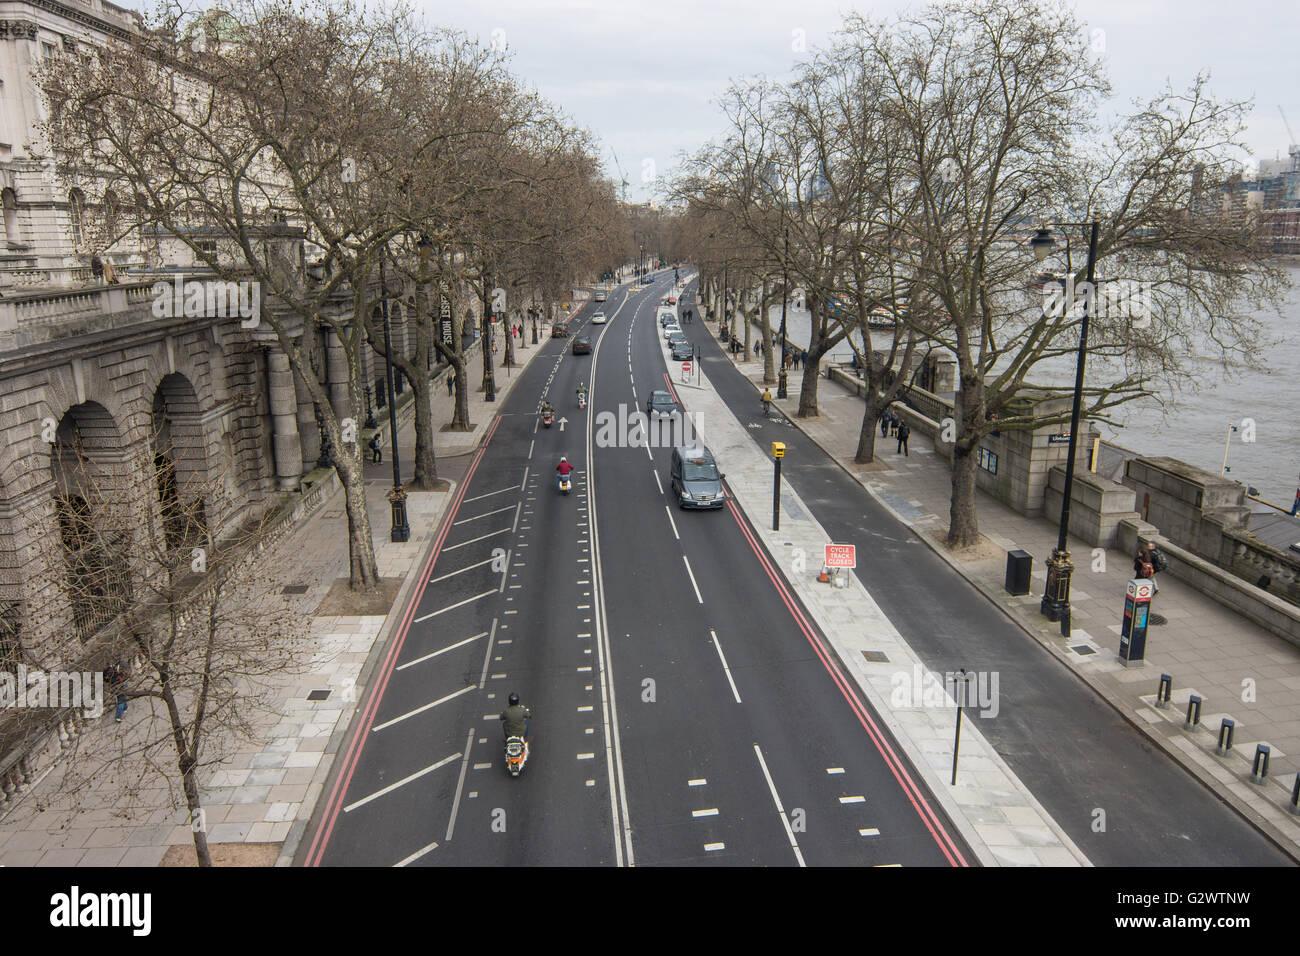 London Embankment,   Cycle Lanes - Stock Image